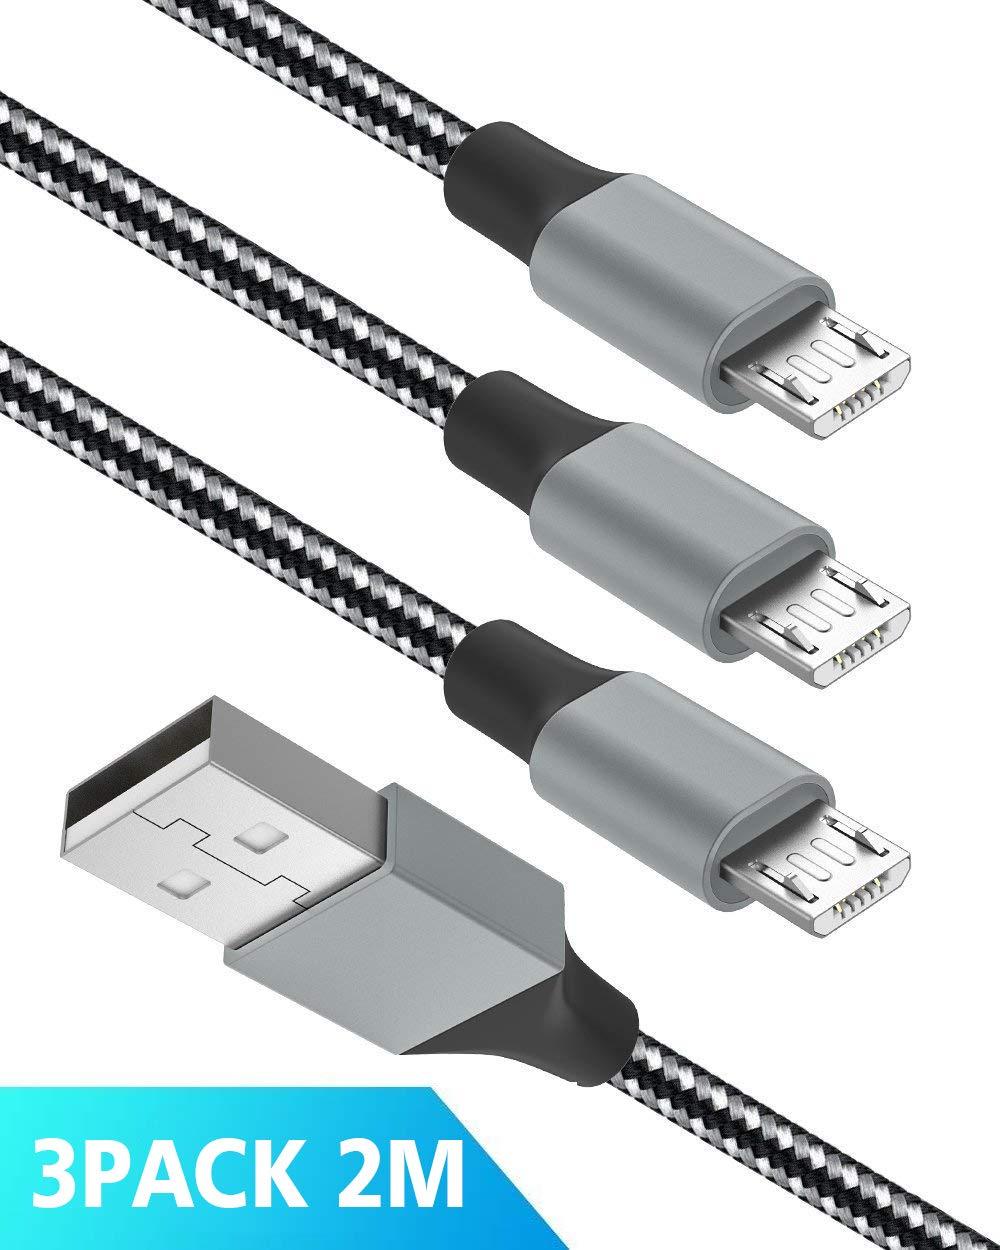 Quntis Cable Micro USB 3 Pack 2m Cable para Cargar Android Durable Nylon Trenzado para Samsung Galaxy S7 S6 EDG S4 S3 S2 Note 5 4 2 HTC Motorola Nexus ...